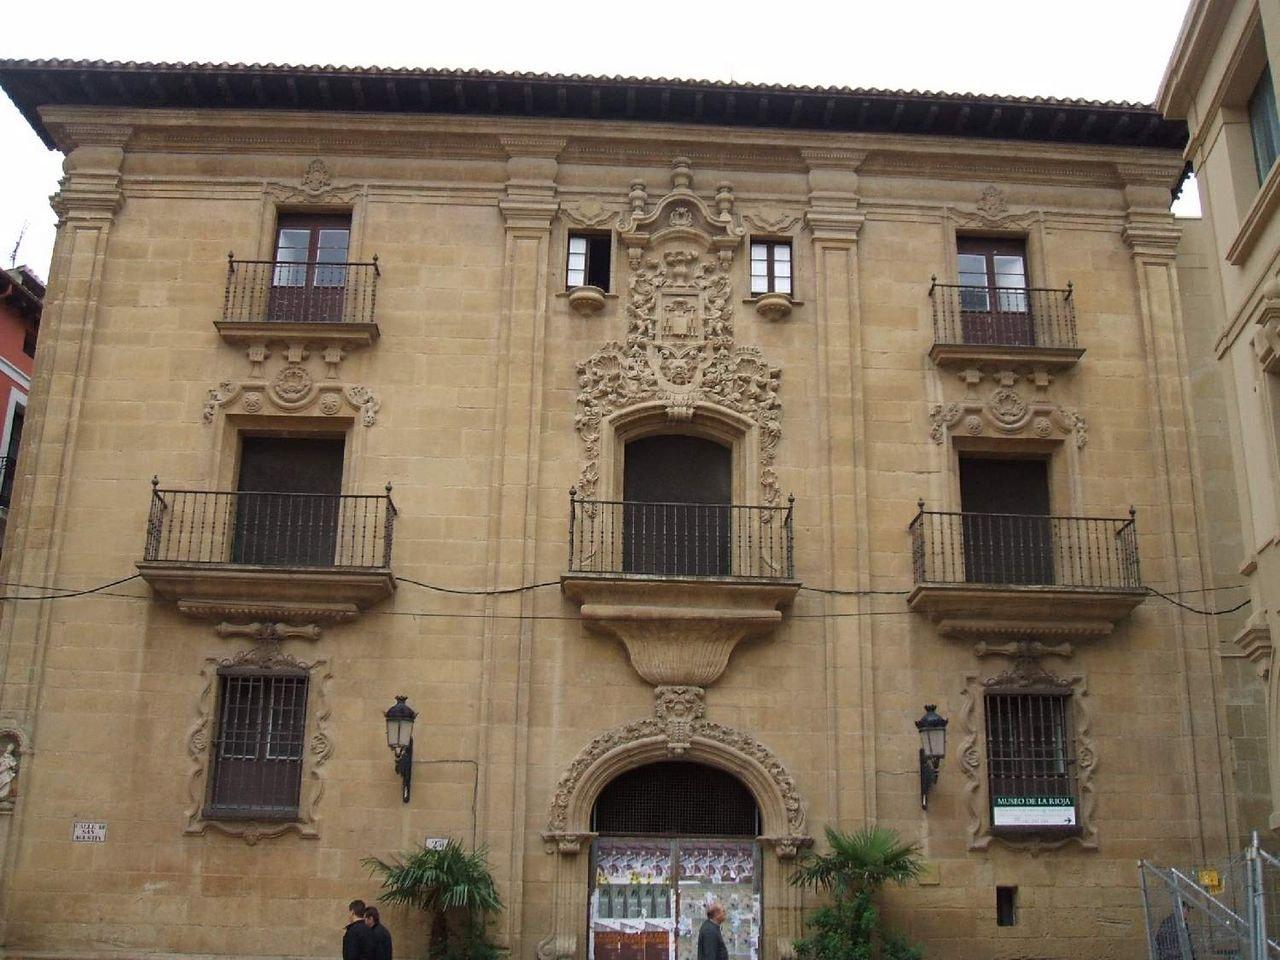 Museo de La Rioja, Logroño | ©Zarateman / Wikimedia commons